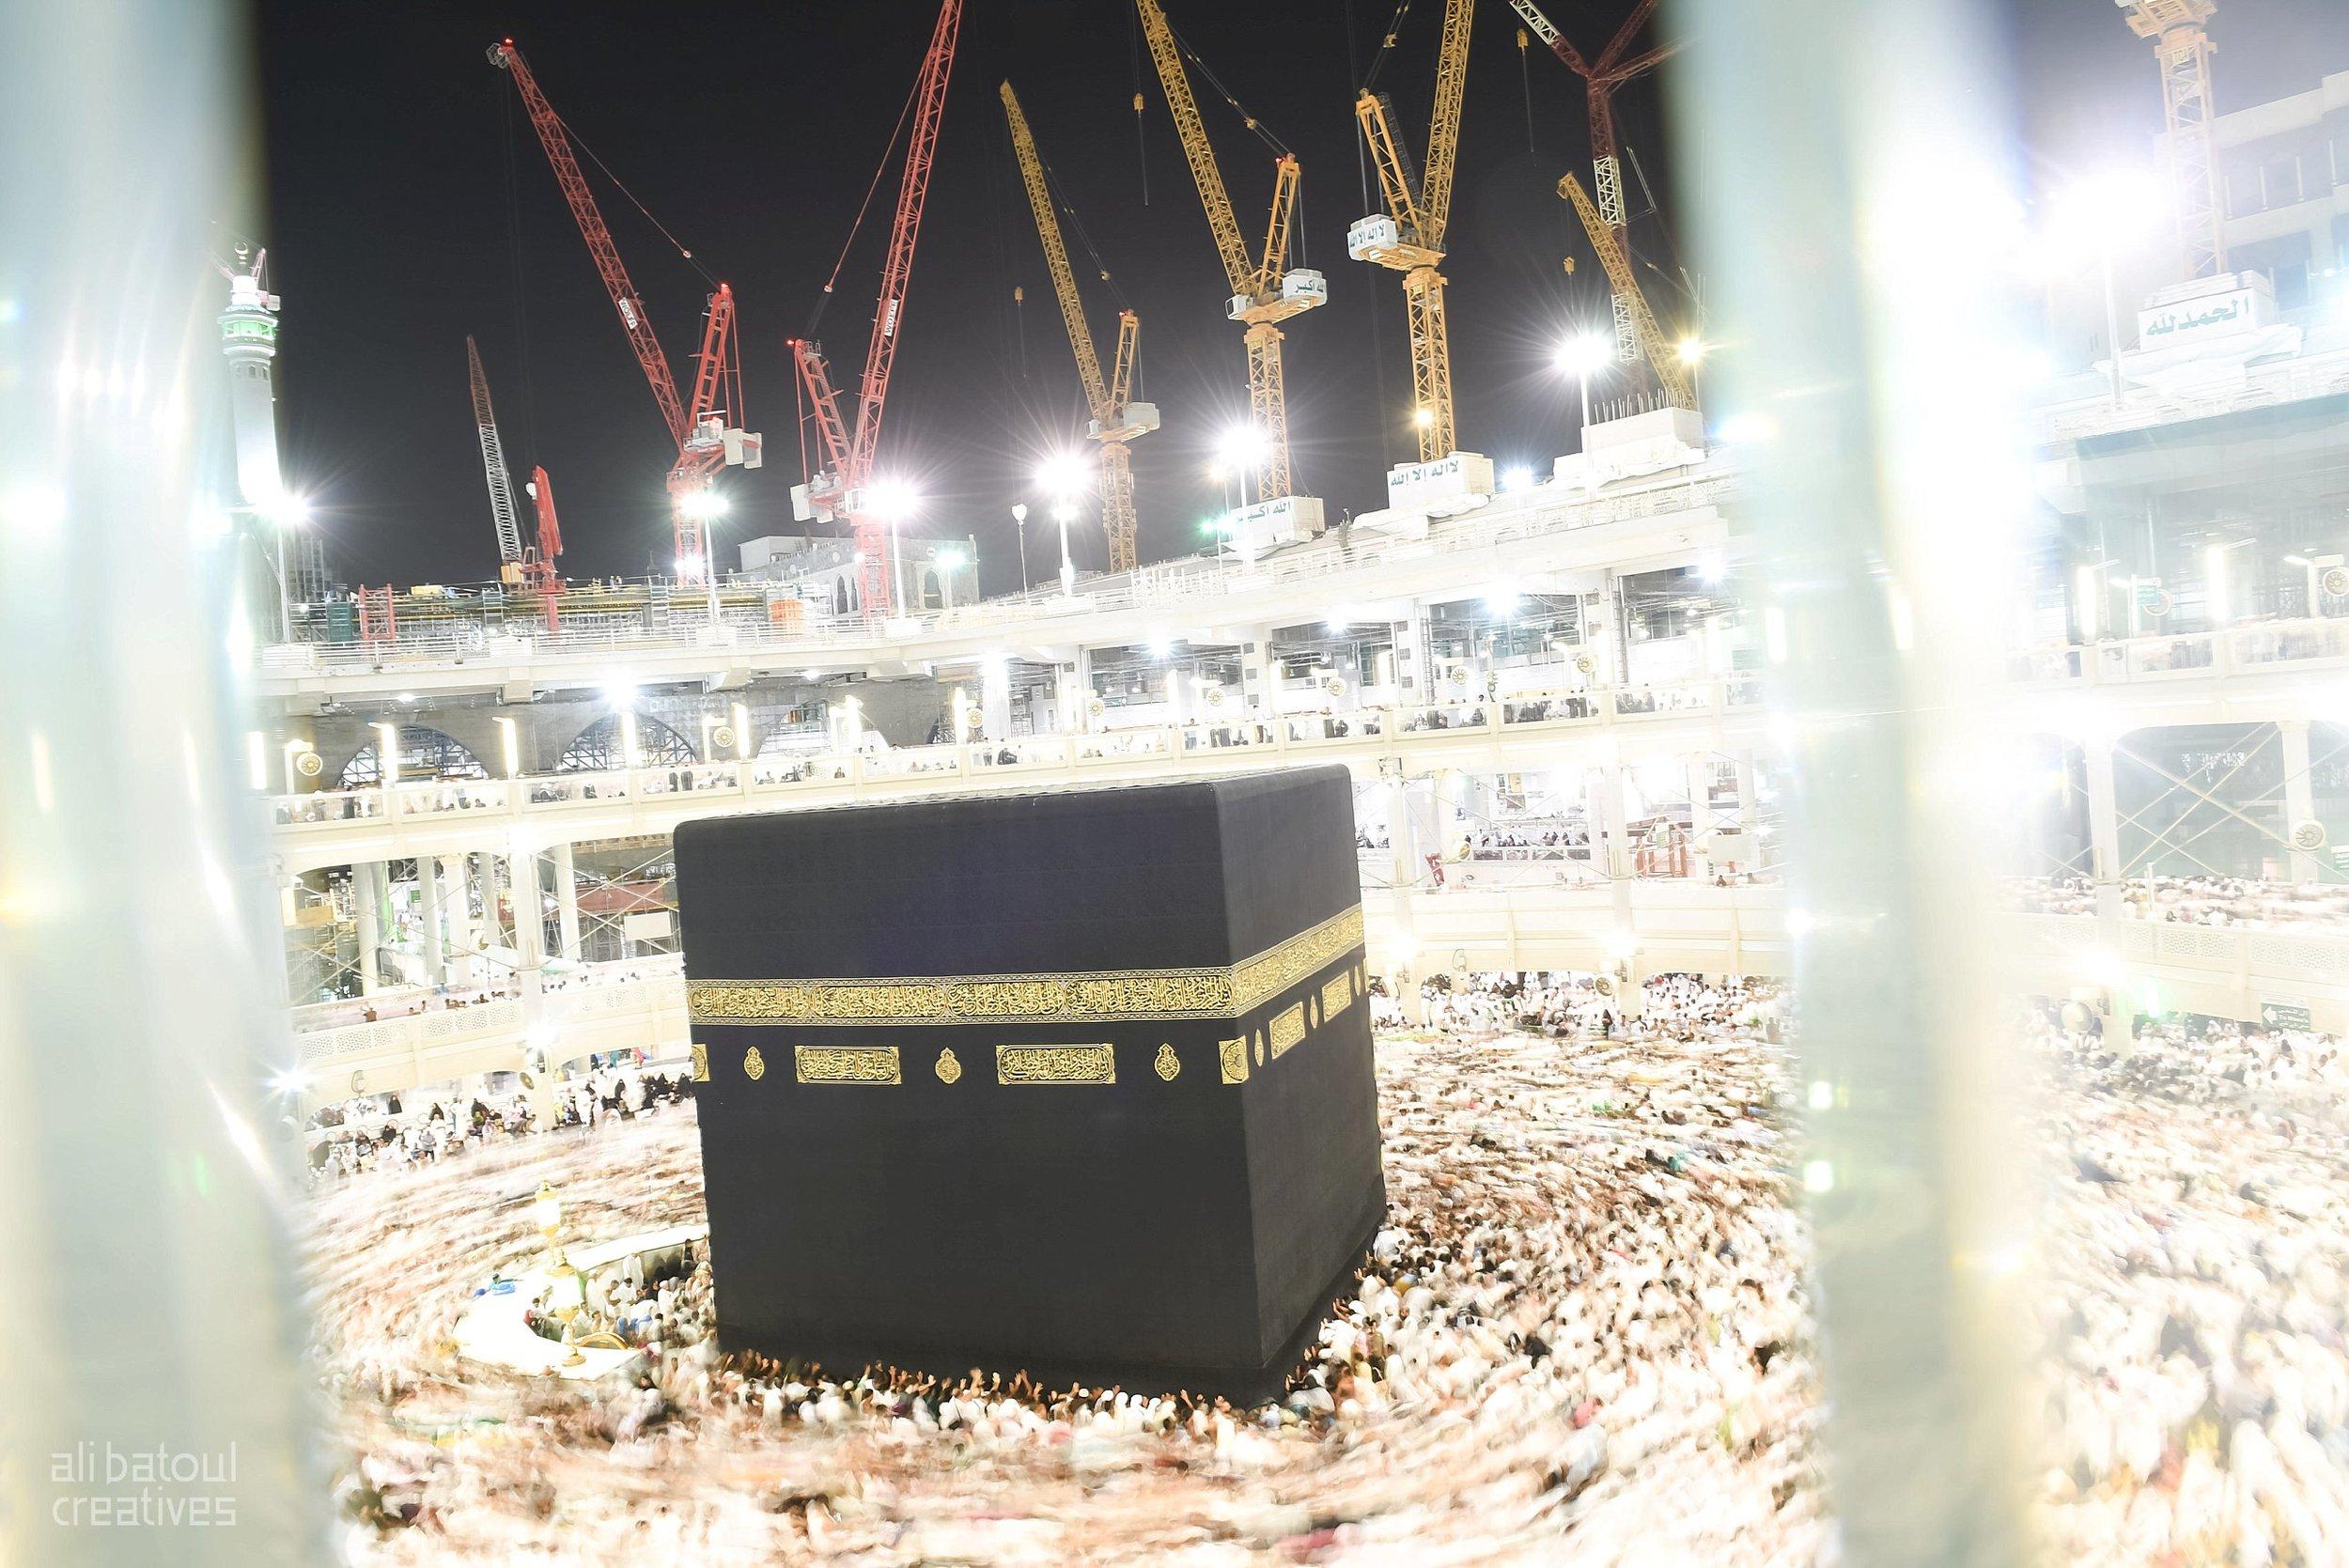 Umrah 2015 (Mecca) - Ali Batoul Creatives-11_Stomped.jpg